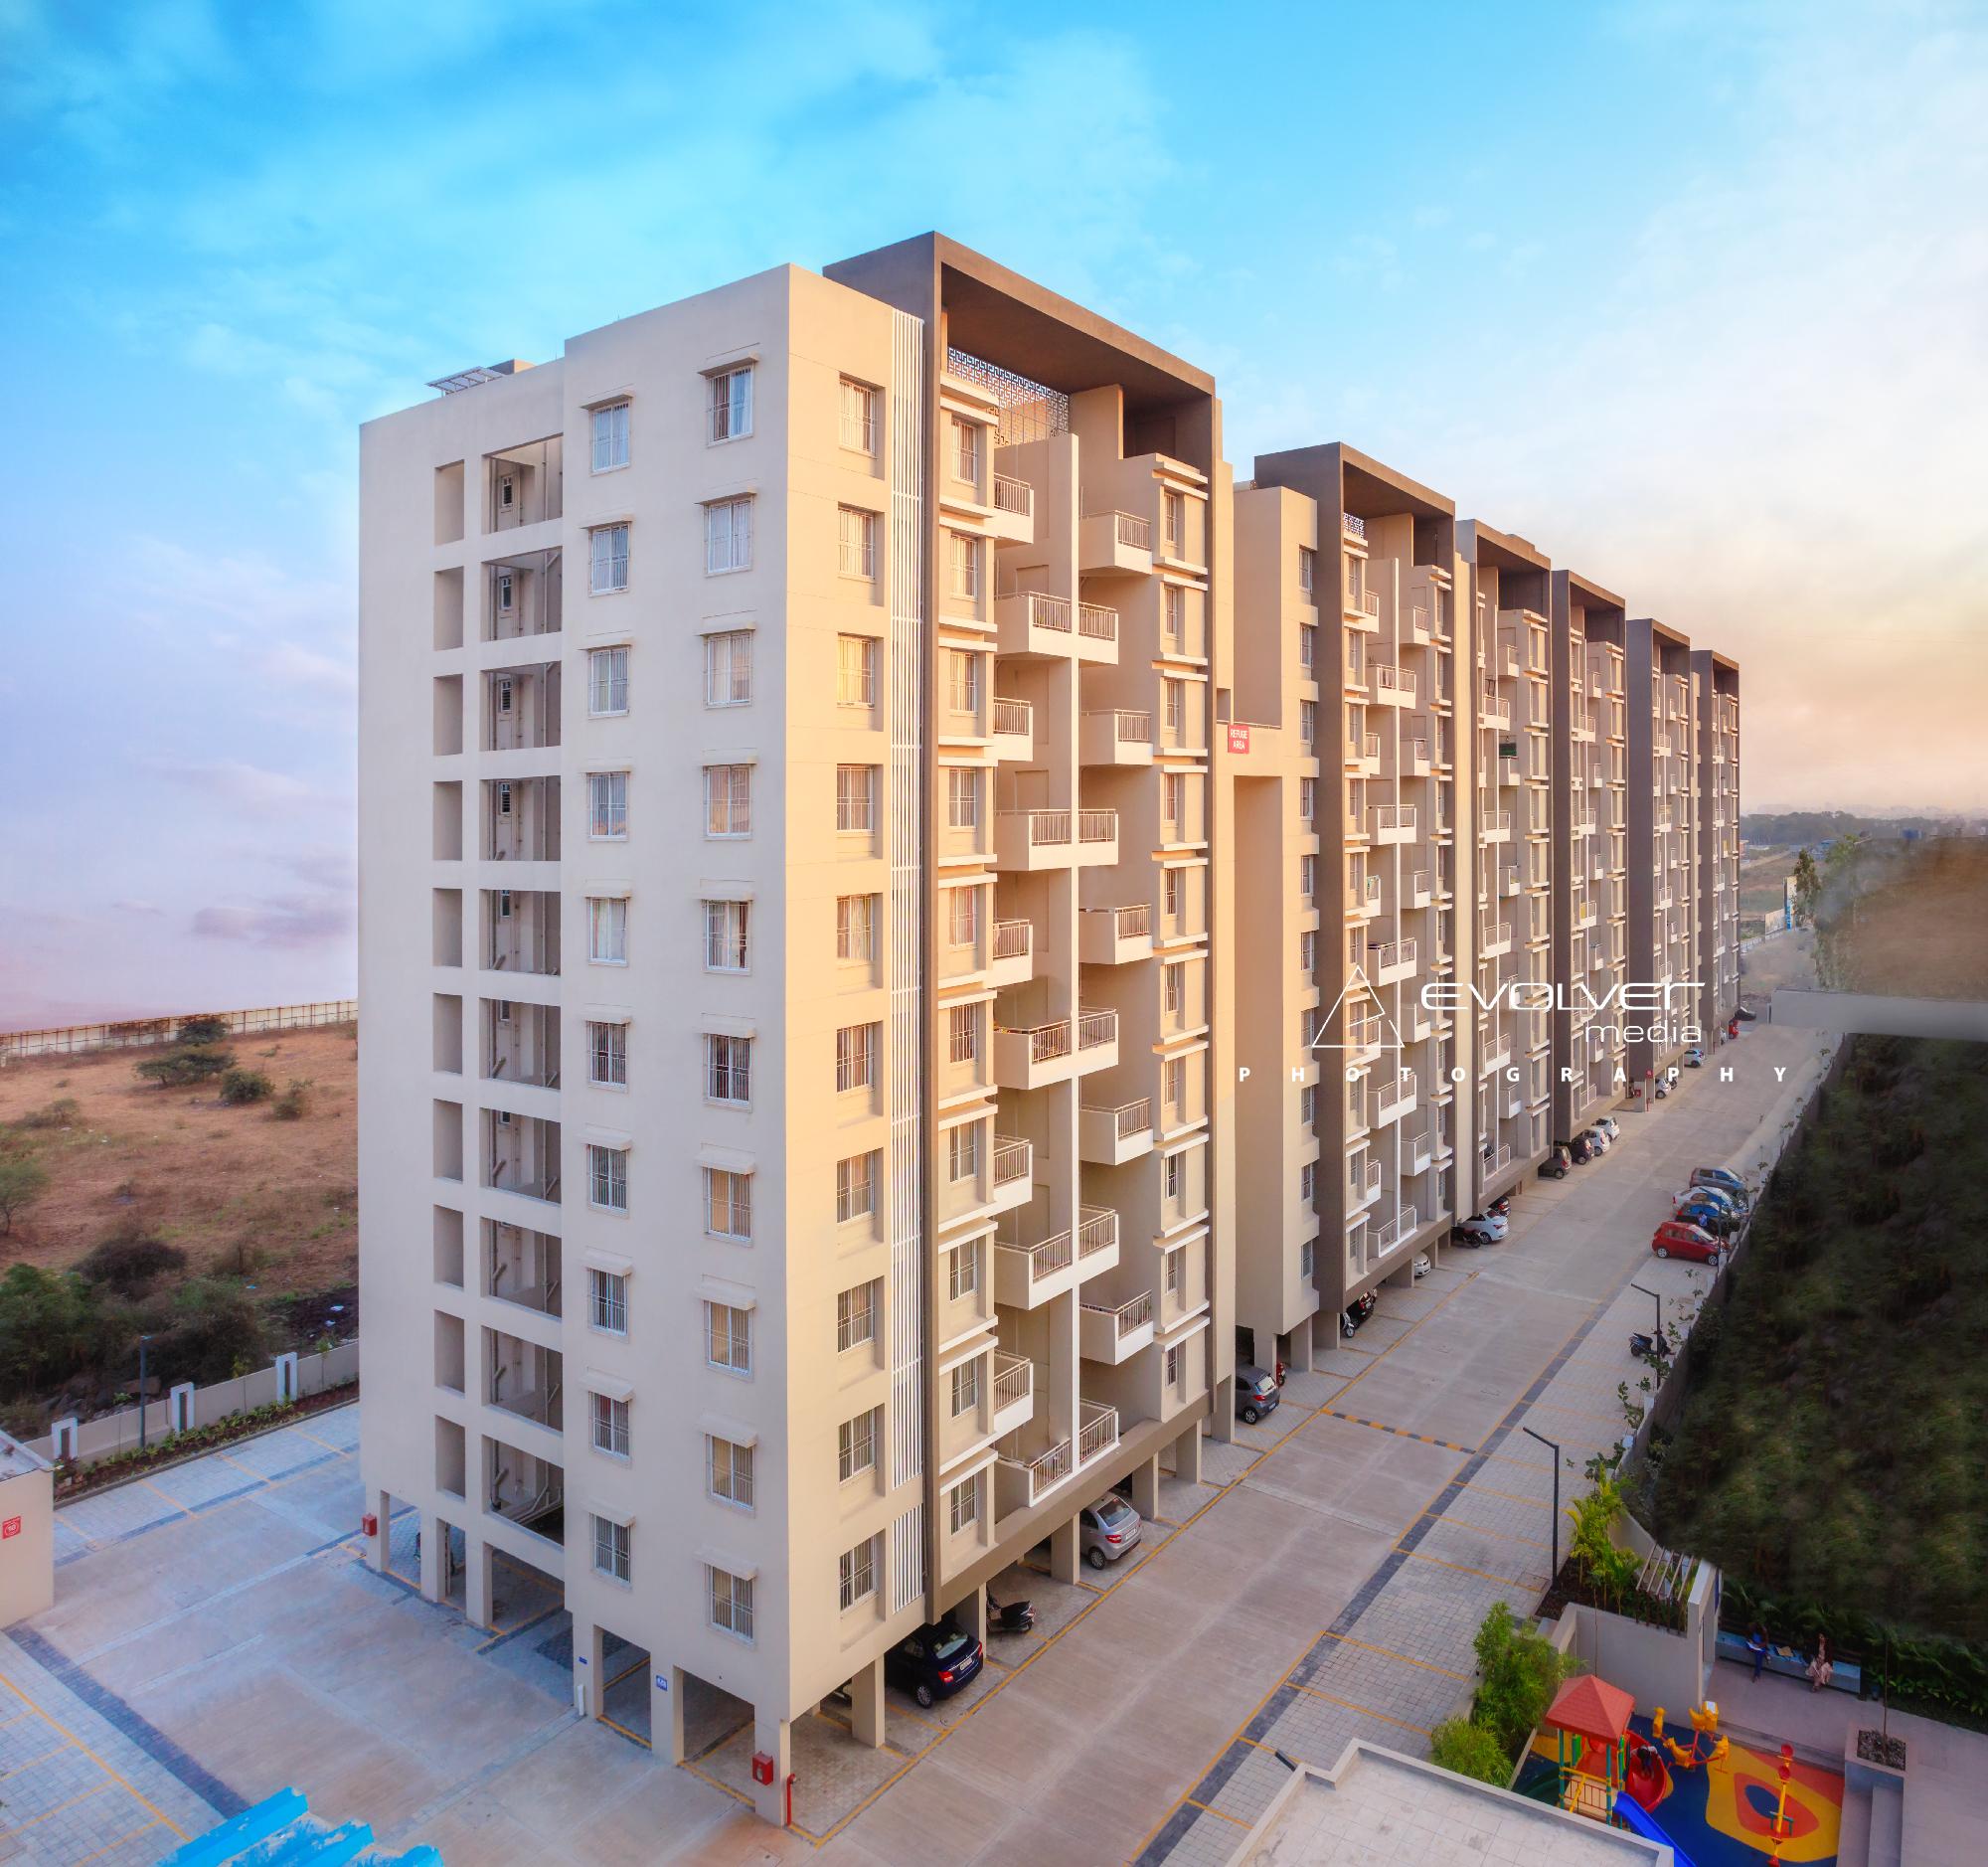 evolver-media-exterior-real-estate-photography-pune